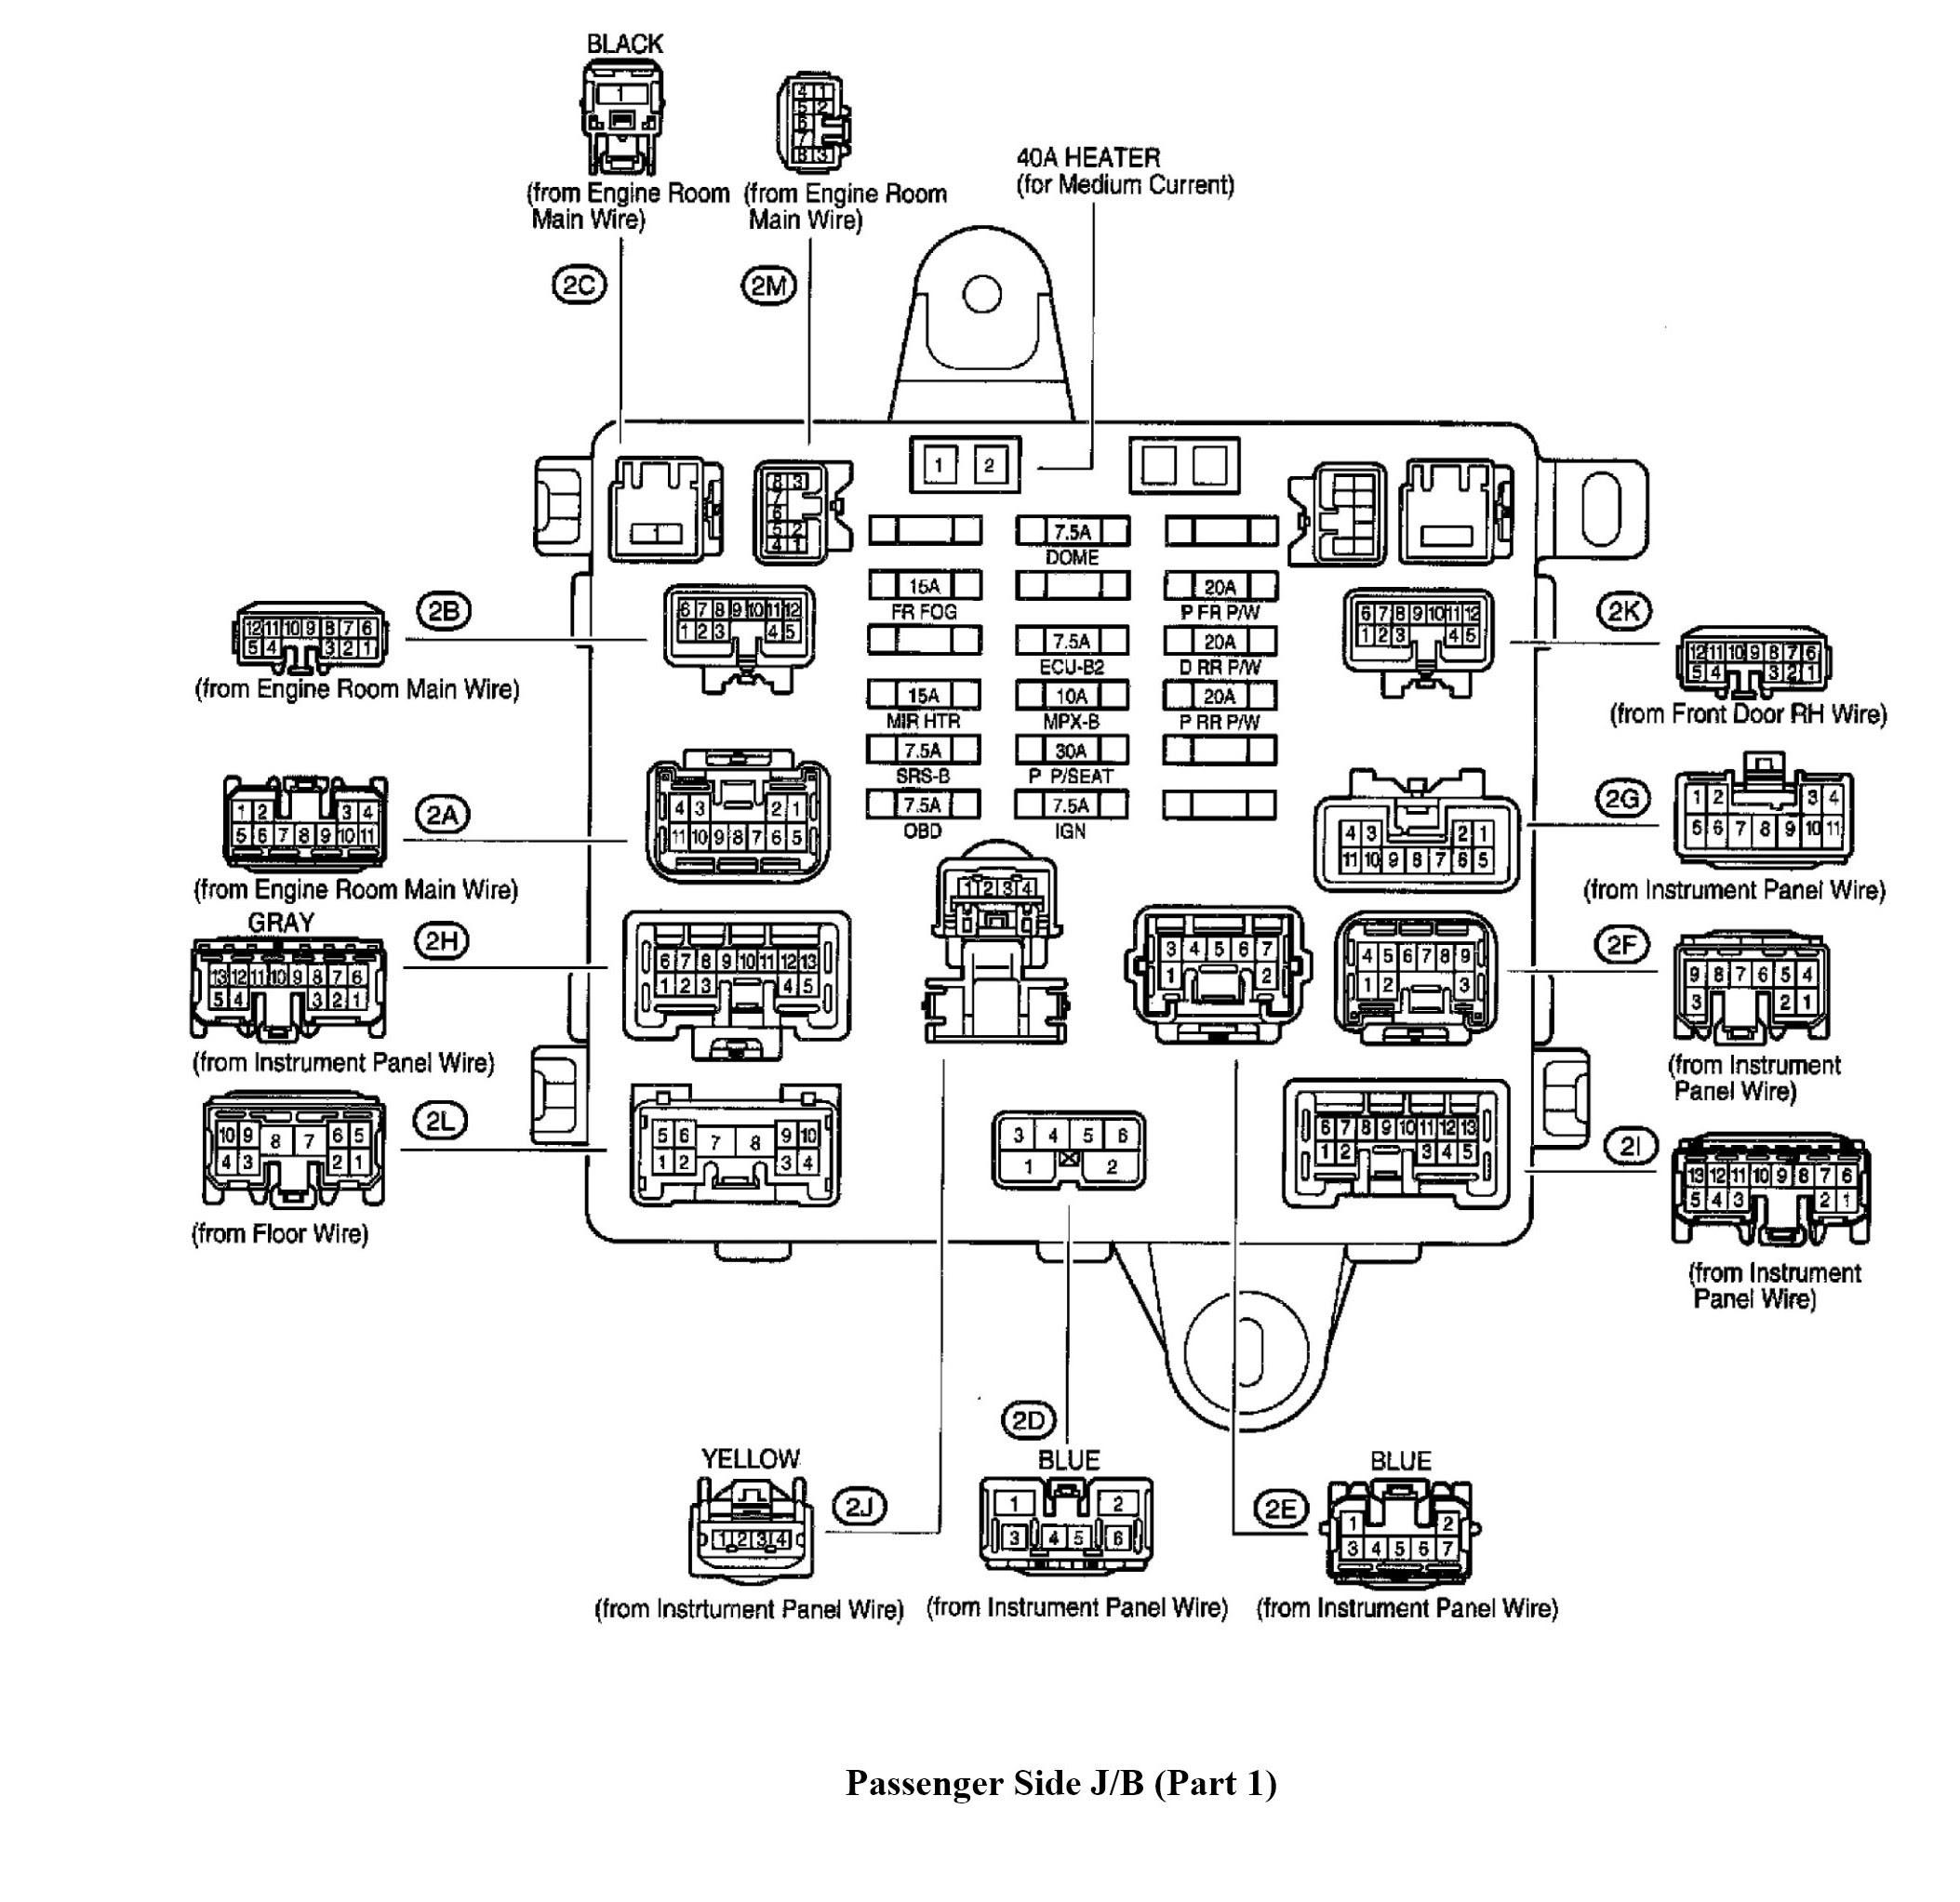 1995 Lexus Ls400 Fuse Box Diagram Nissan 240sx Engine Diagram For Wiring Diagram Schematics